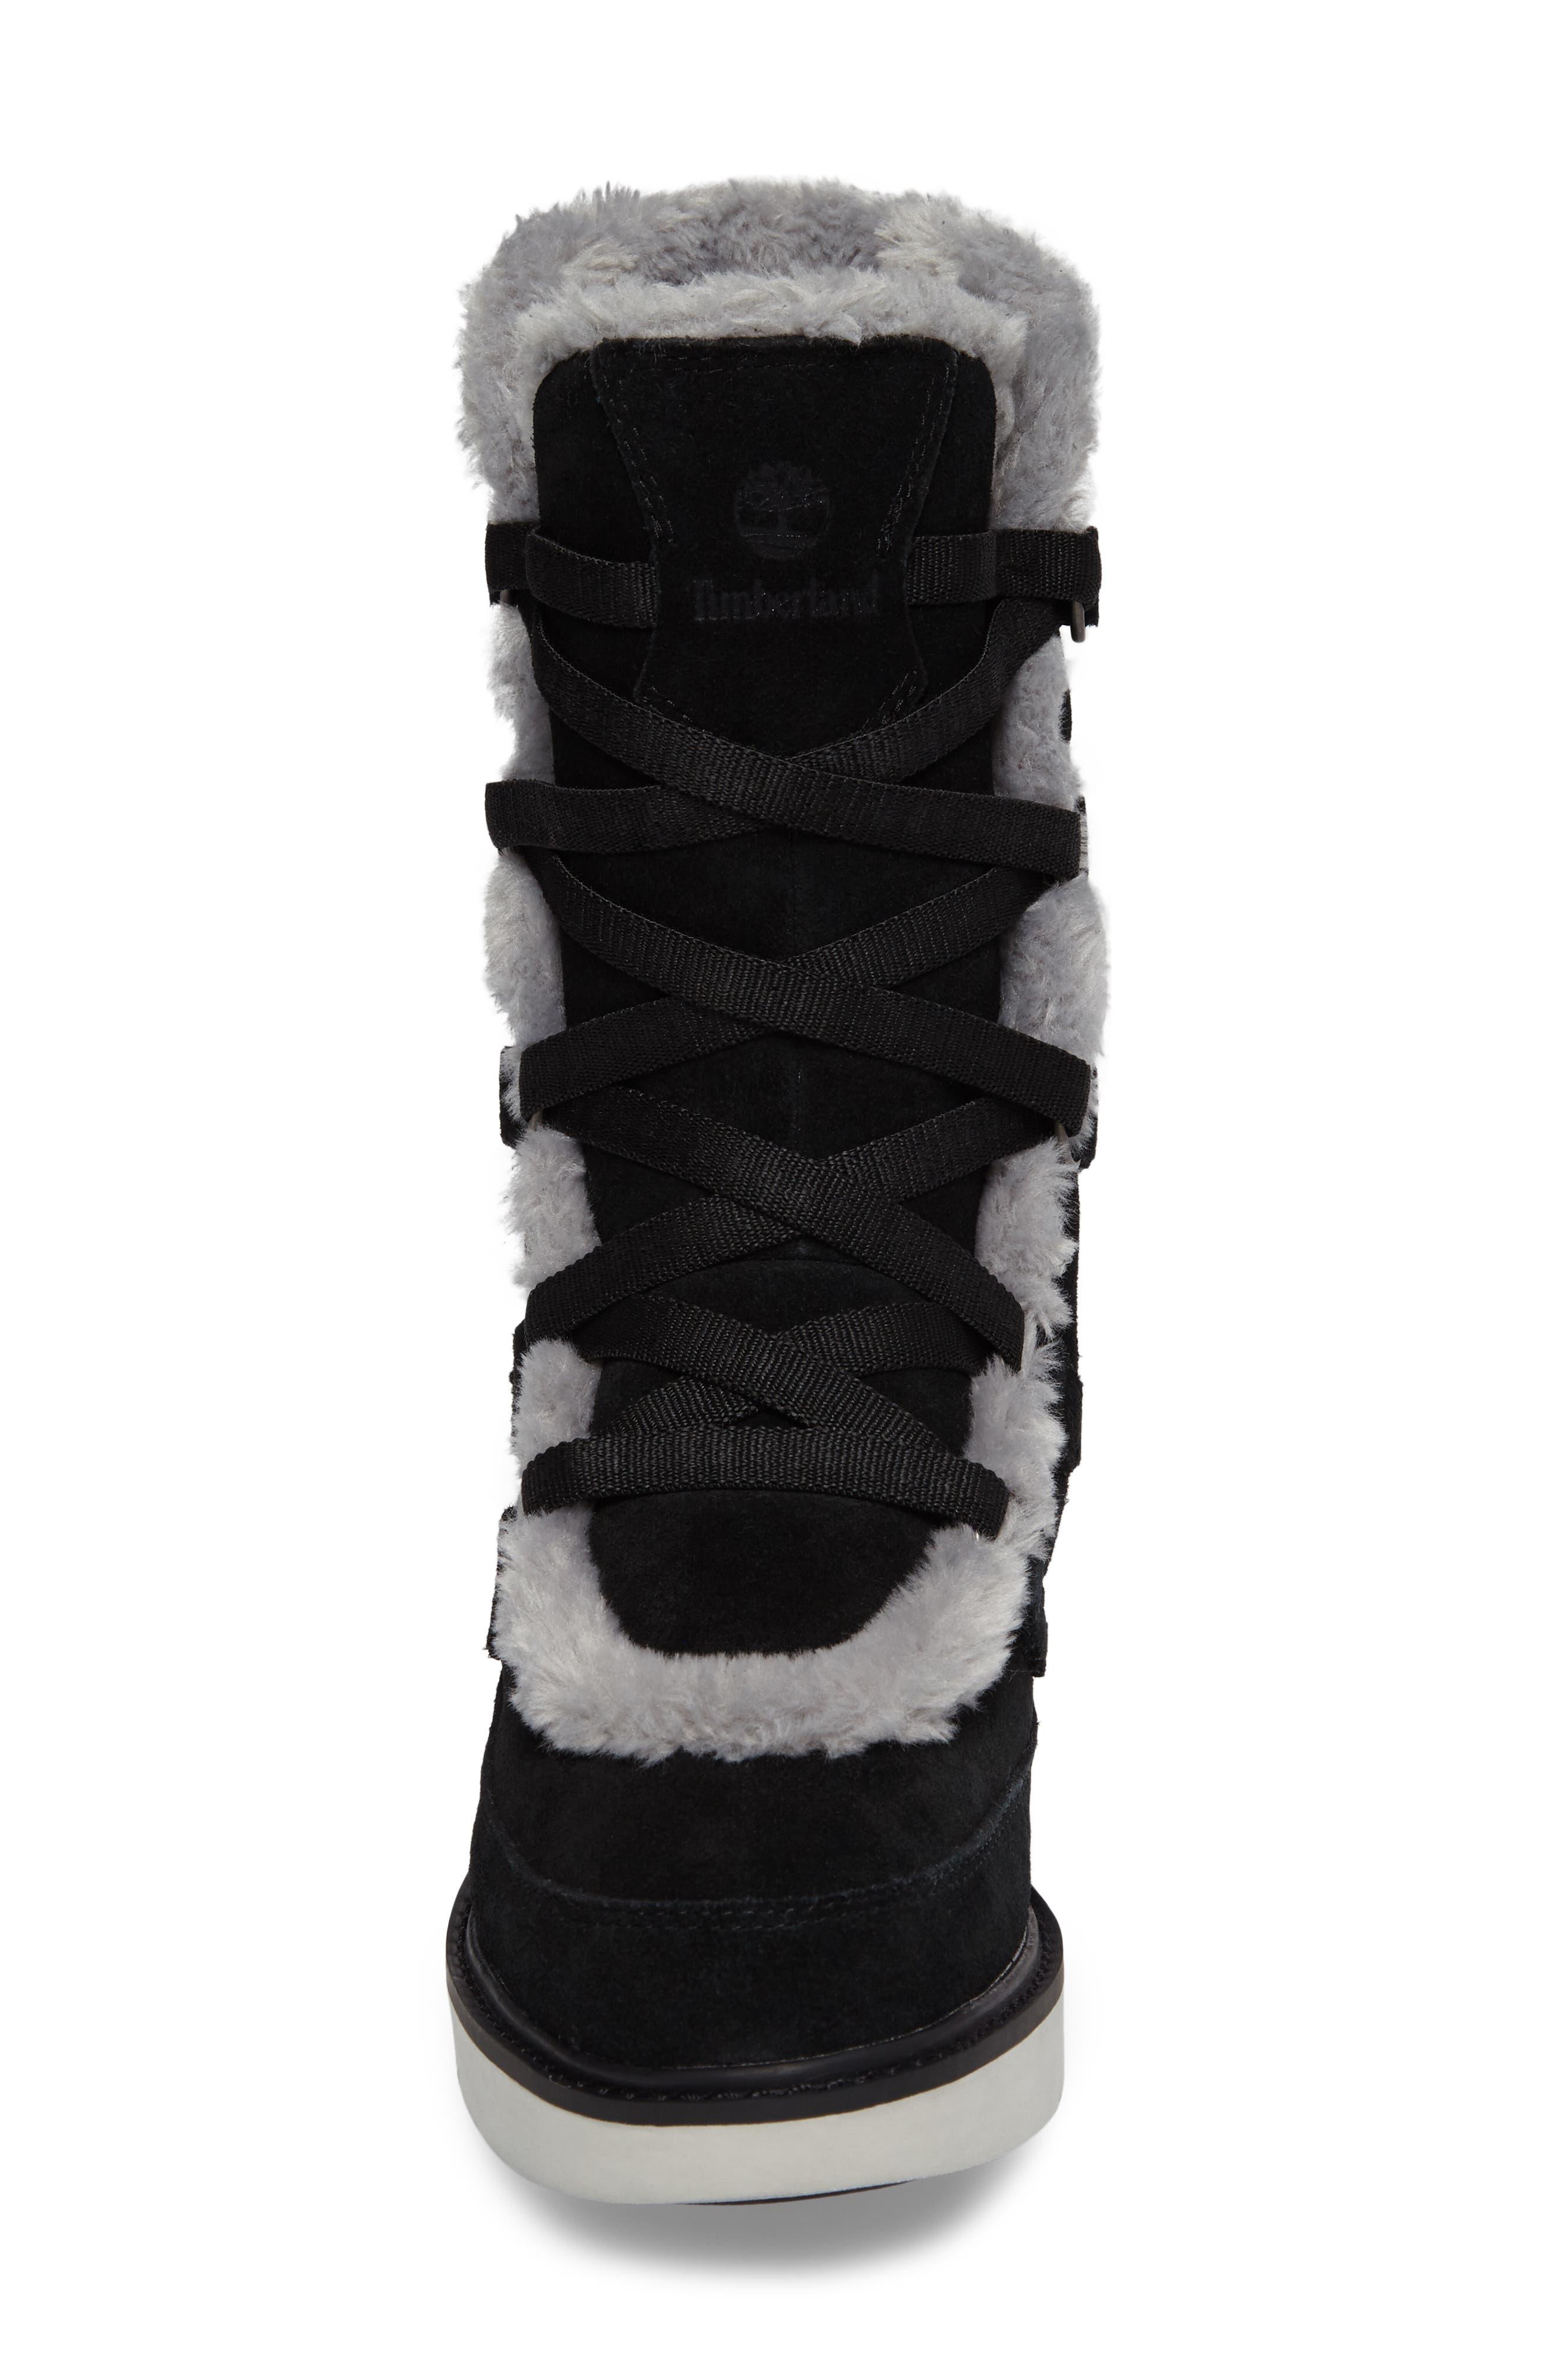 Kenniston Faux Fur Water Resistant Mukluk Boot,                             Alternate thumbnail 4, color,                             001